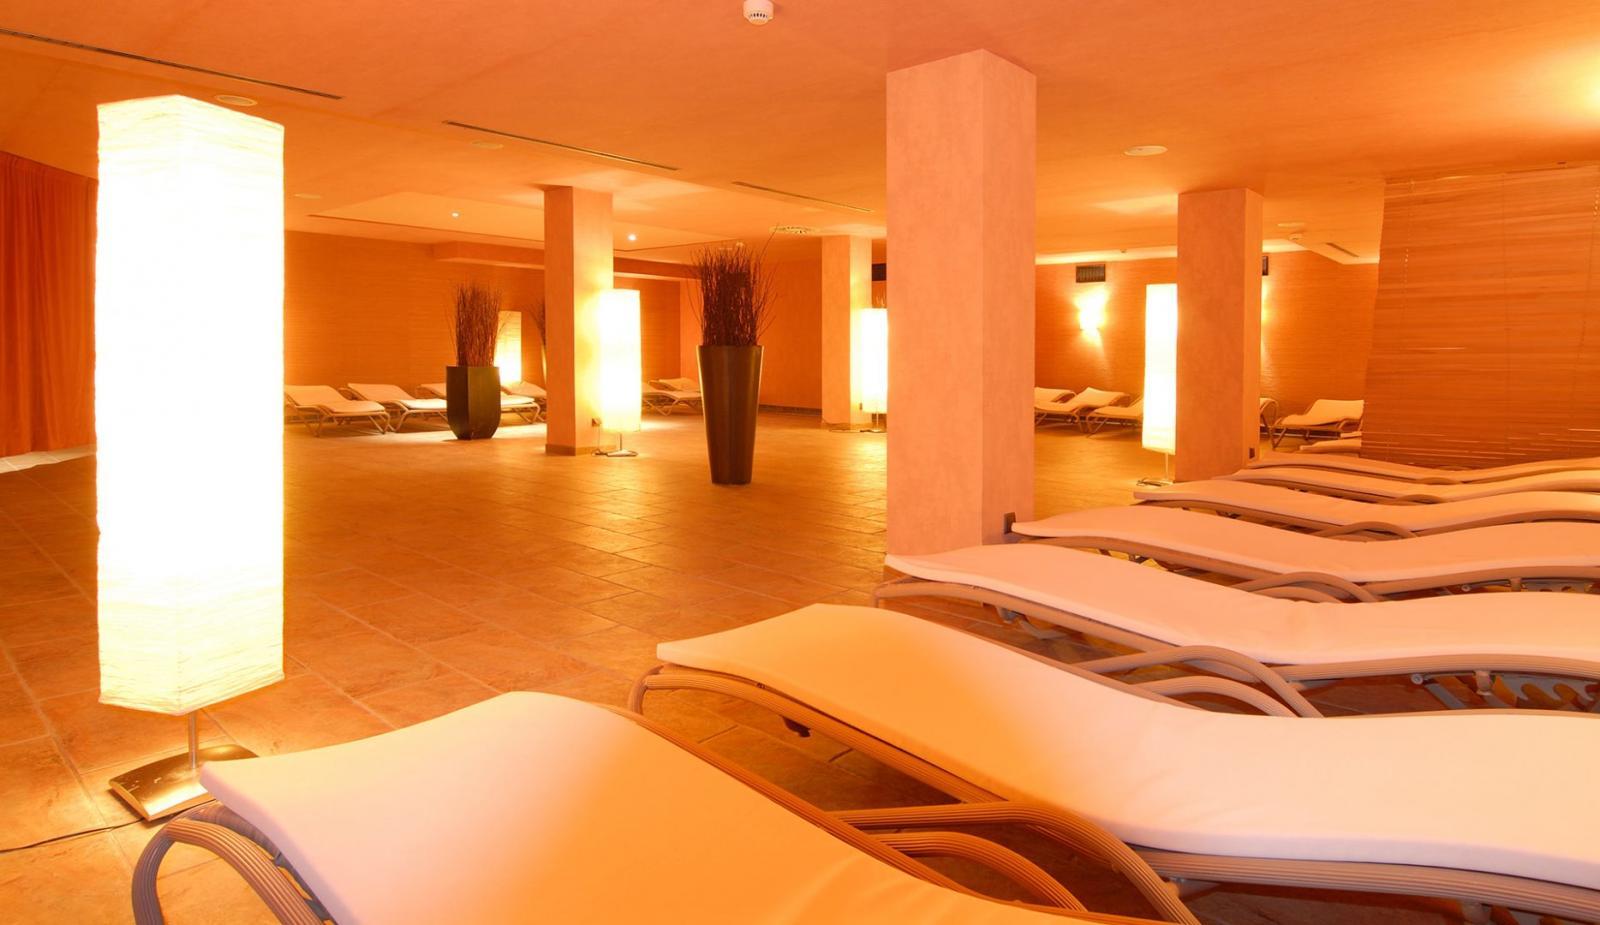 wellnesshotels frankfurt am main hessen bewertungen f r wellness hotels. Black Bedroom Furniture Sets. Home Design Ideas